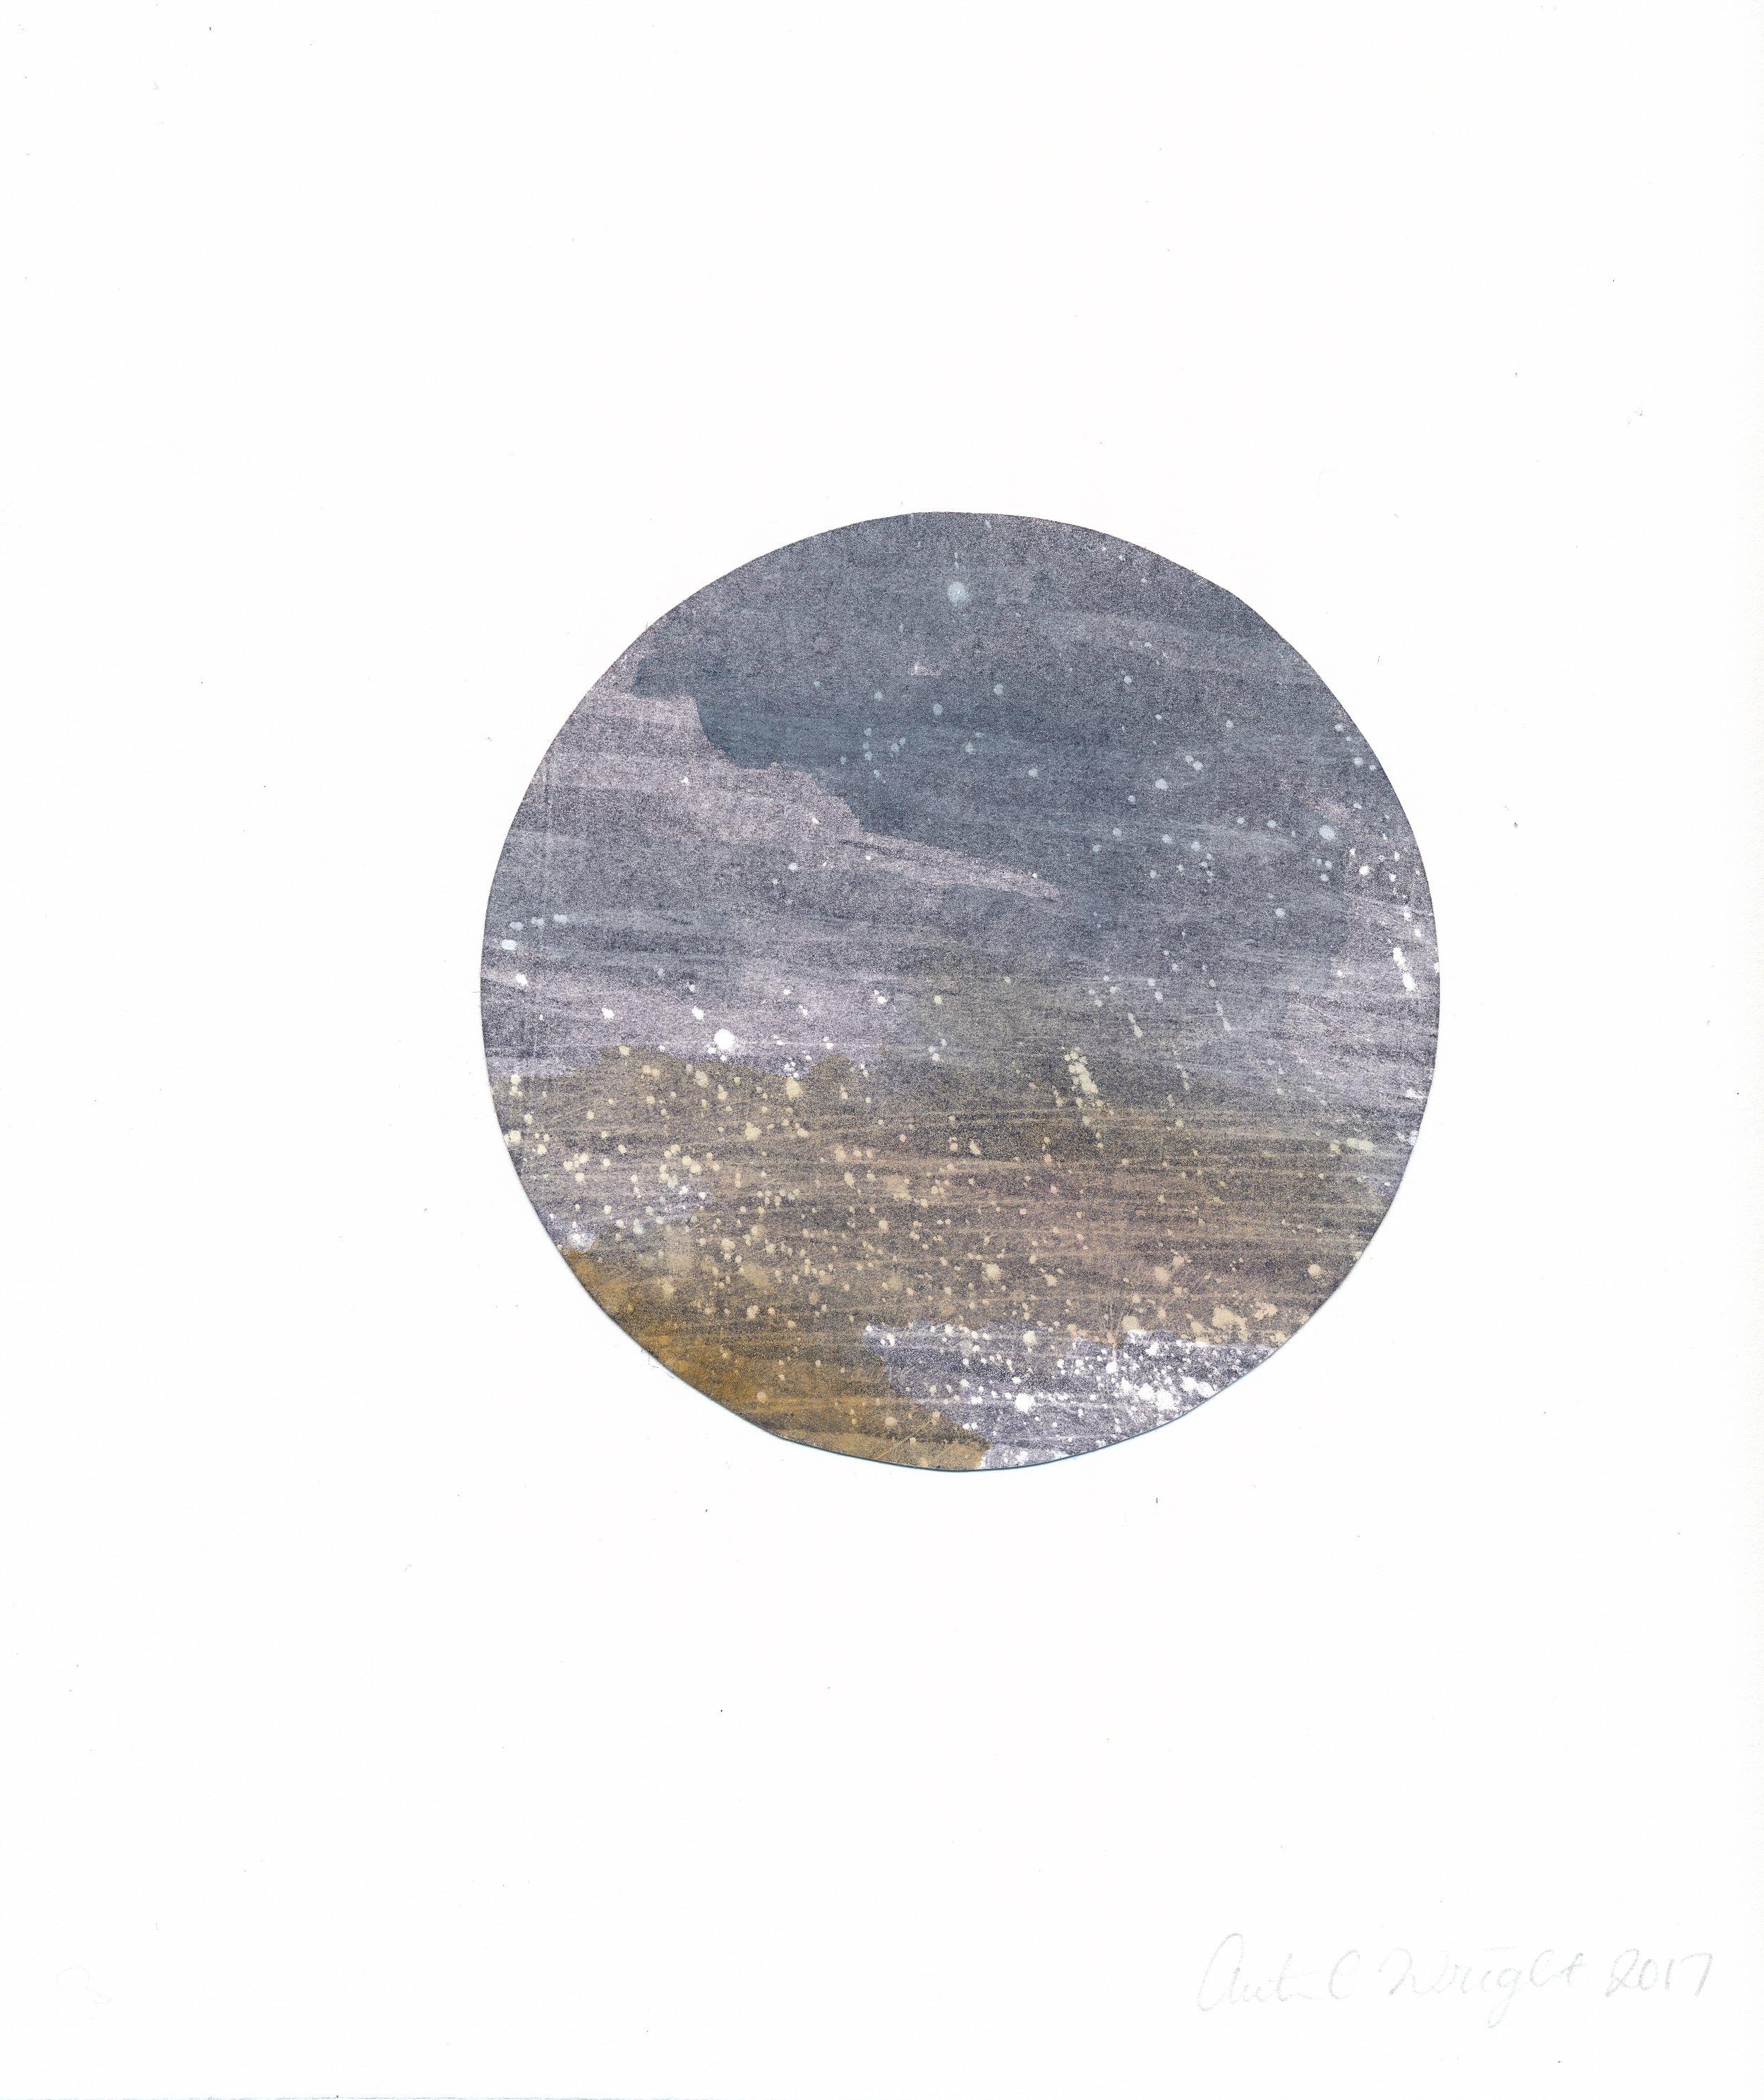 circle177.jpg